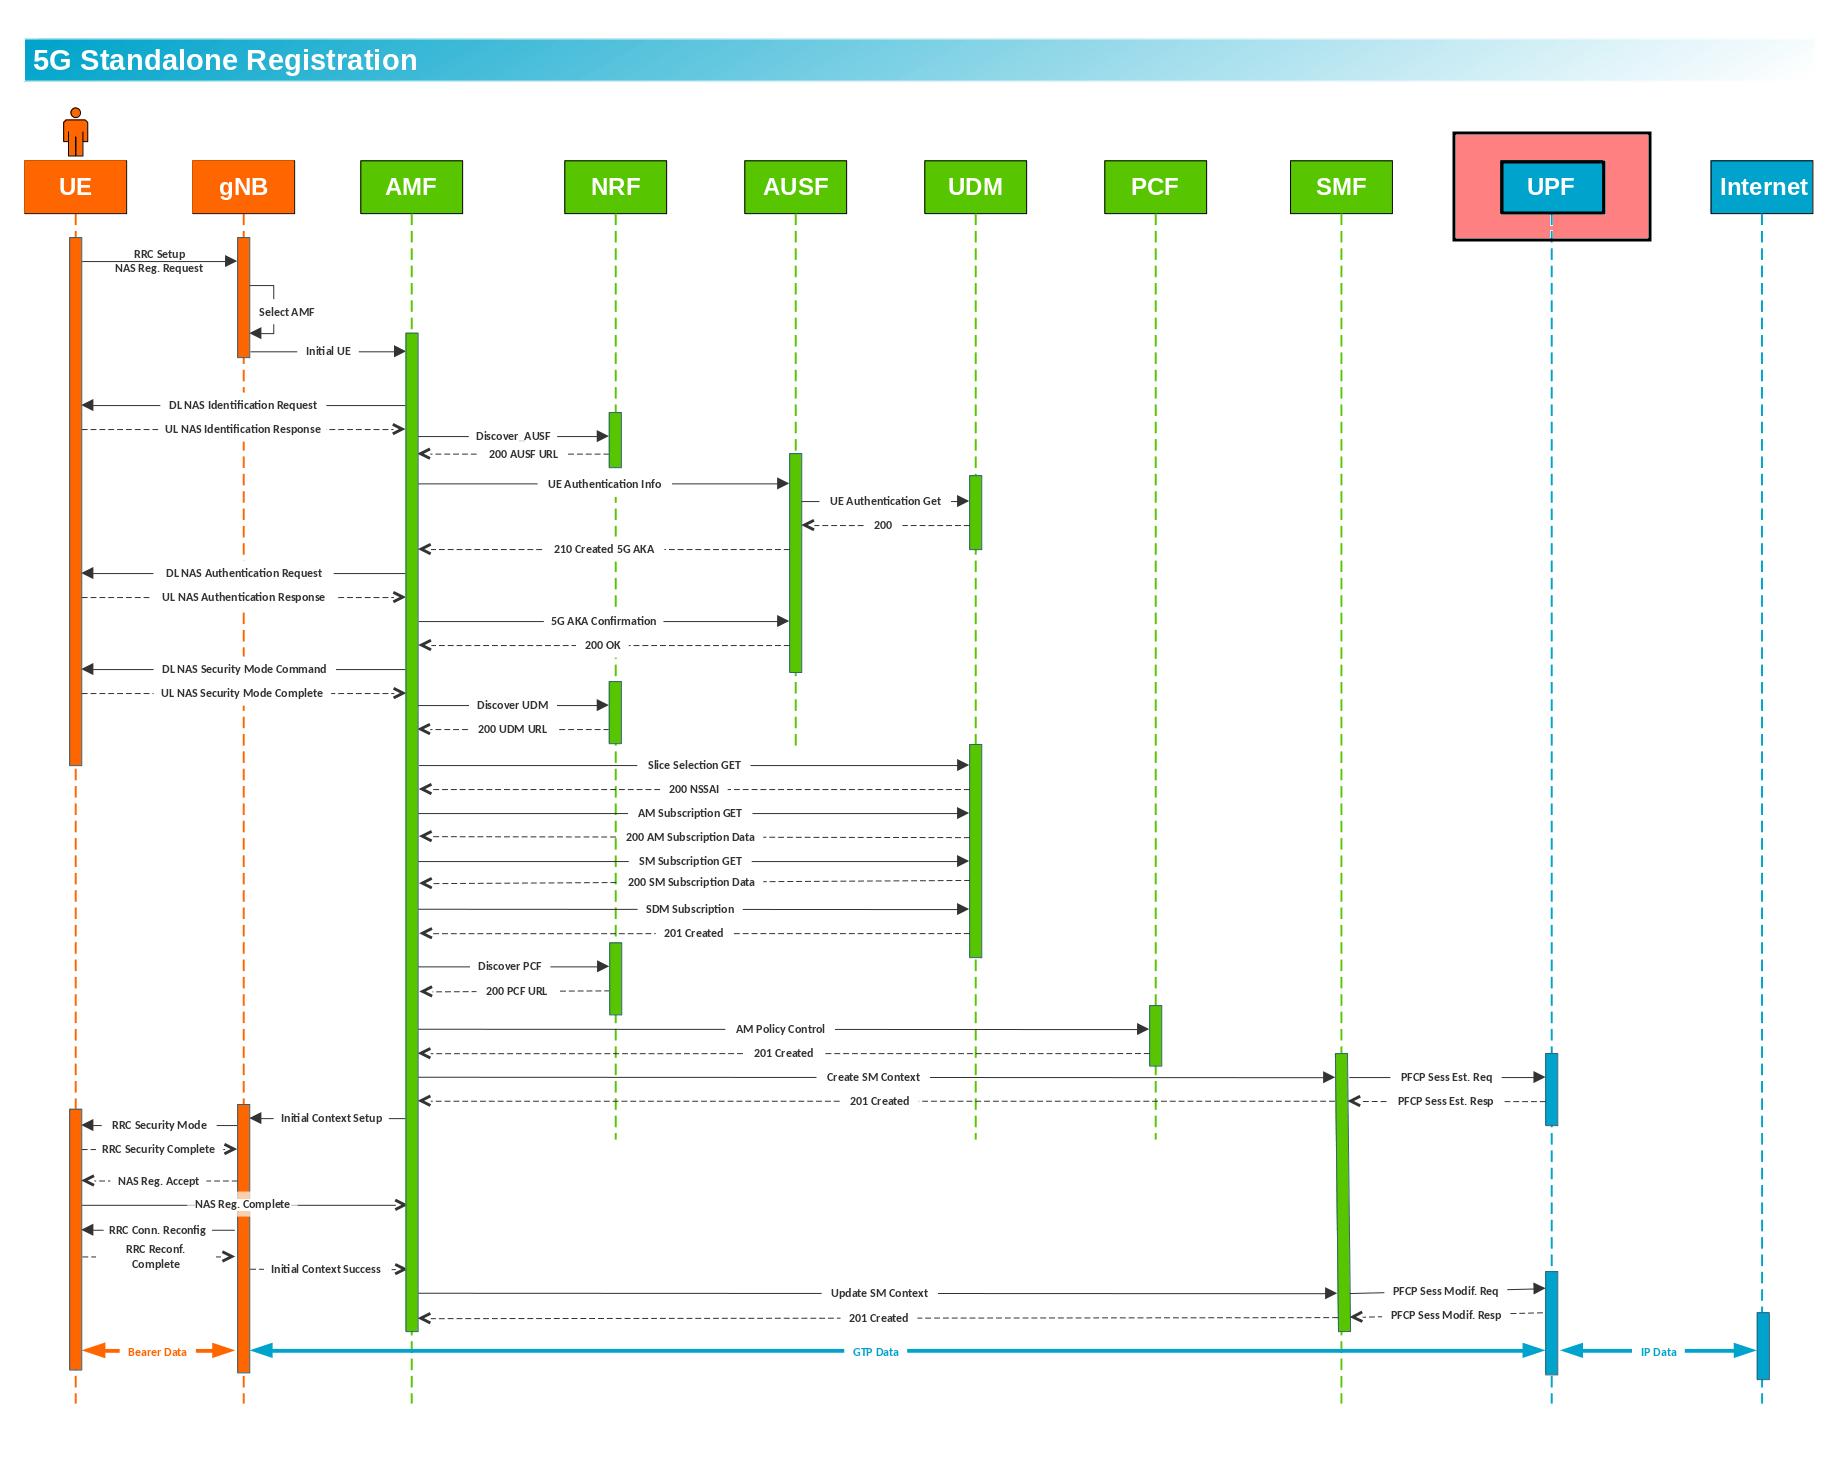 User Plan Function (UPF) 3